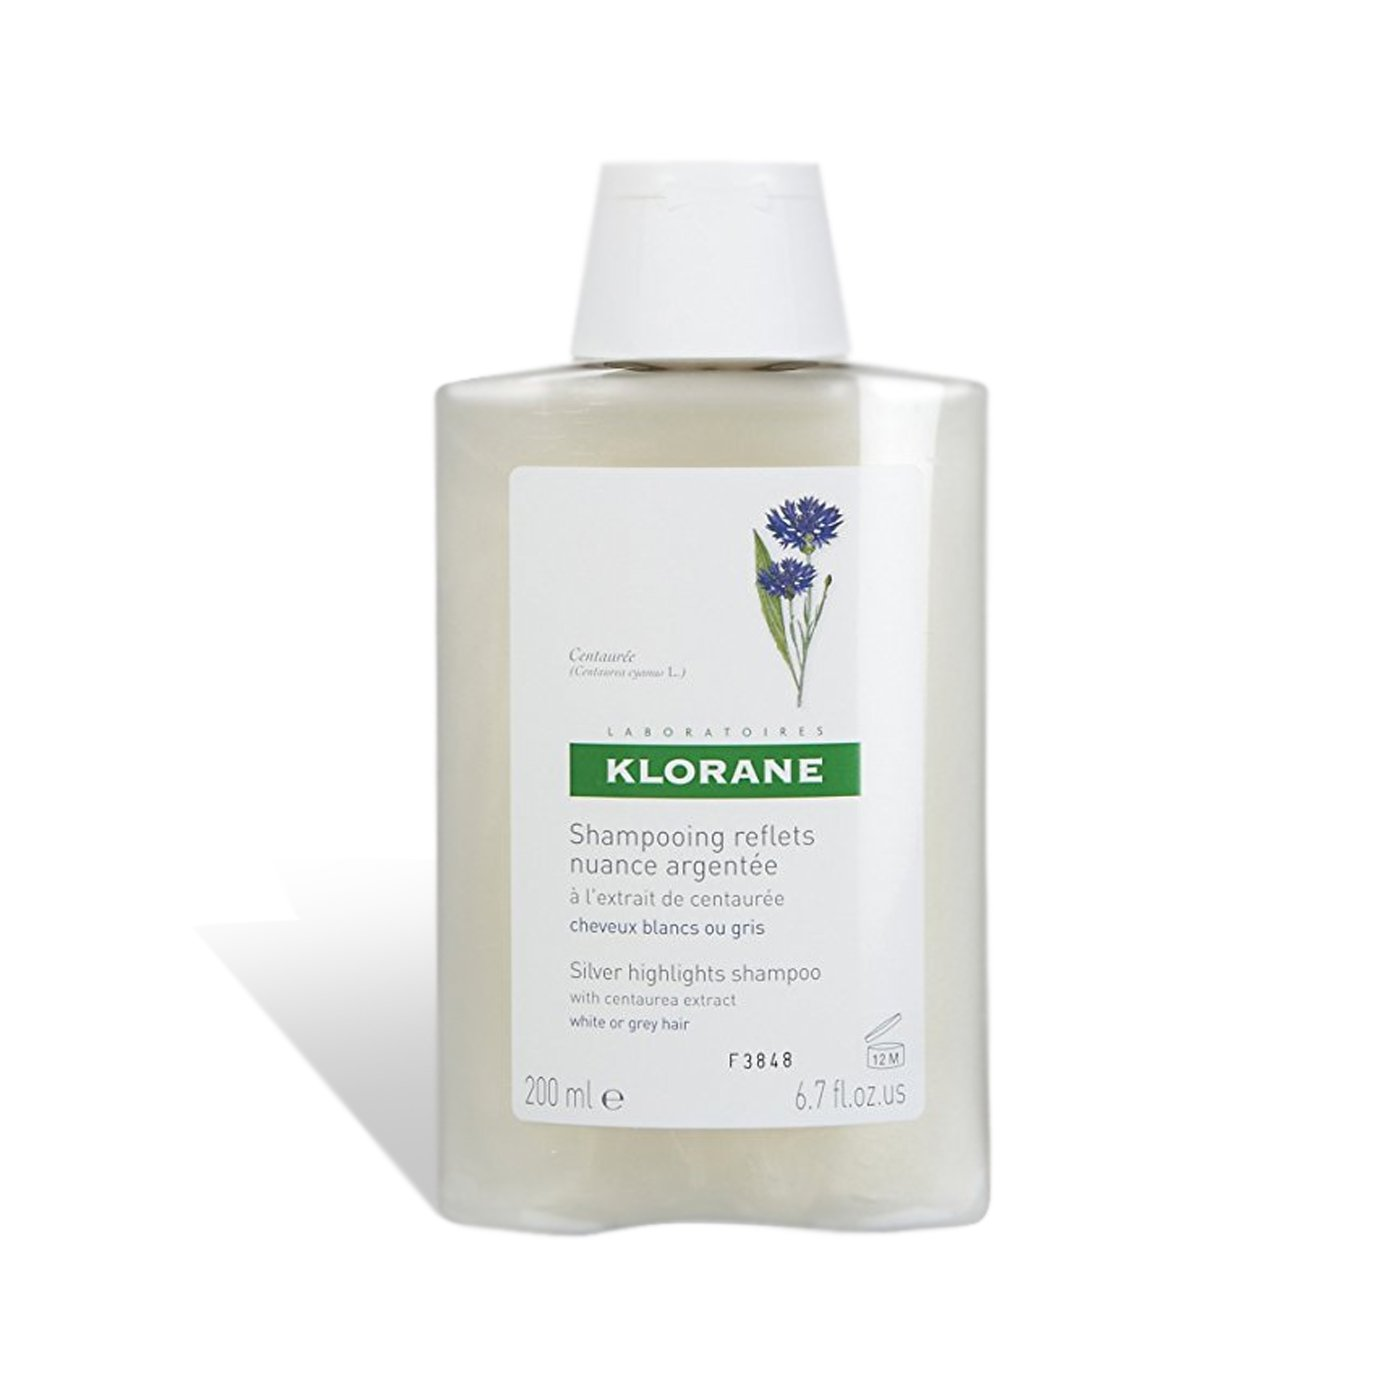 Klorane Shampoo with Centaury for White & Gray Hair, 6.7 fl. oz.